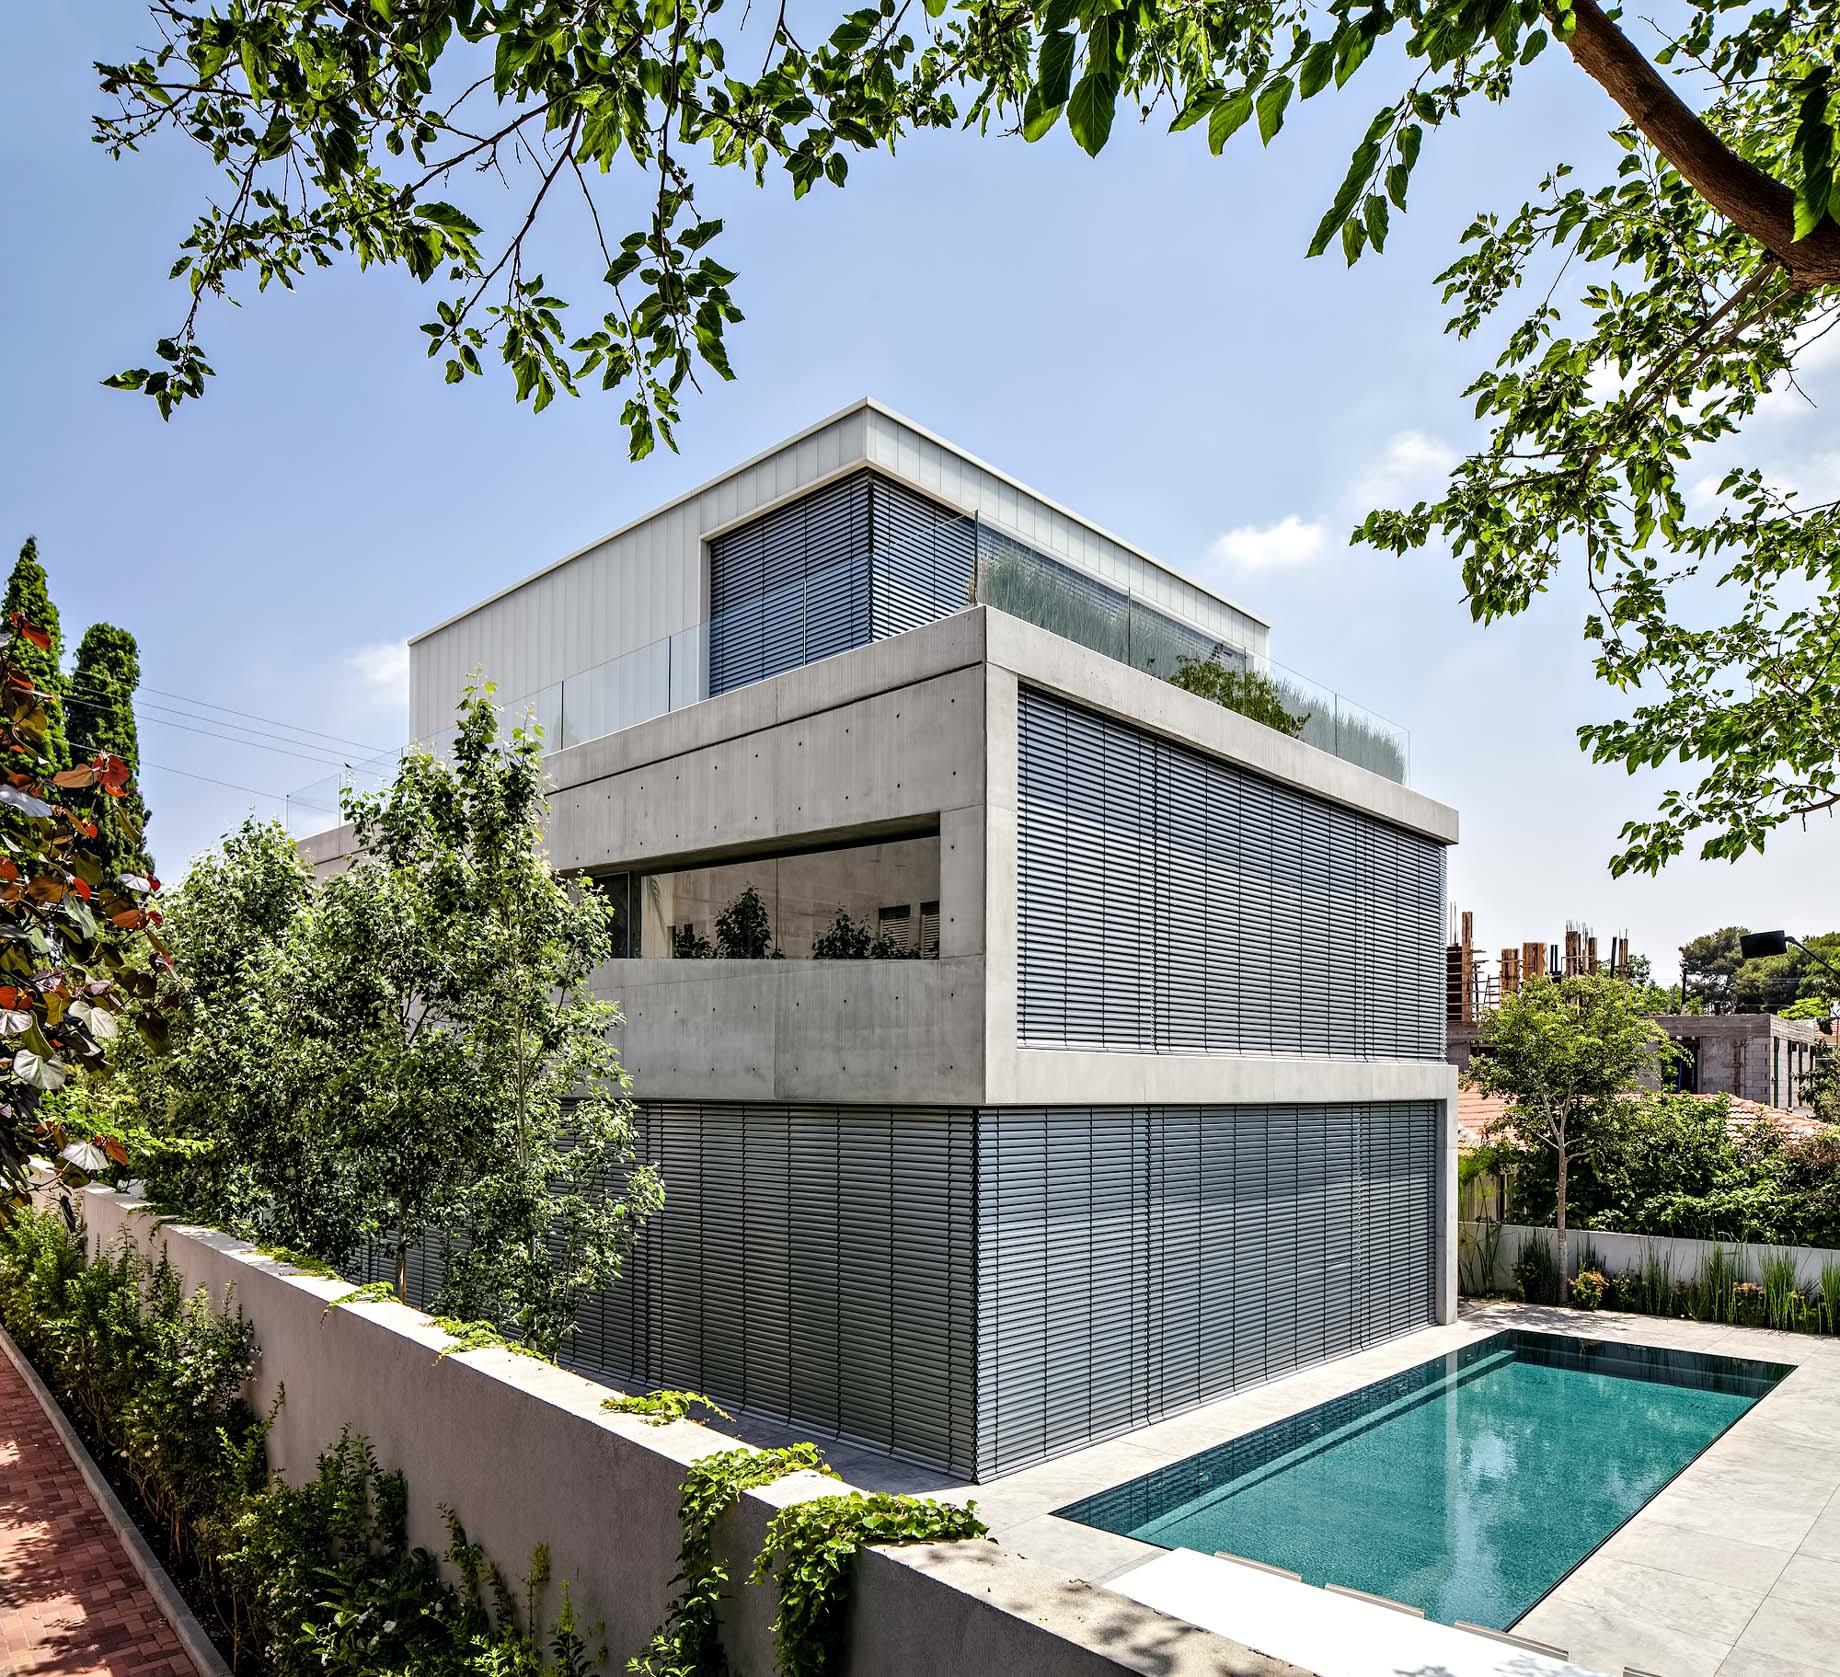 08 – Concrete Cut Luxury Residence – Ramat Gan, Tel Aviv, Israel